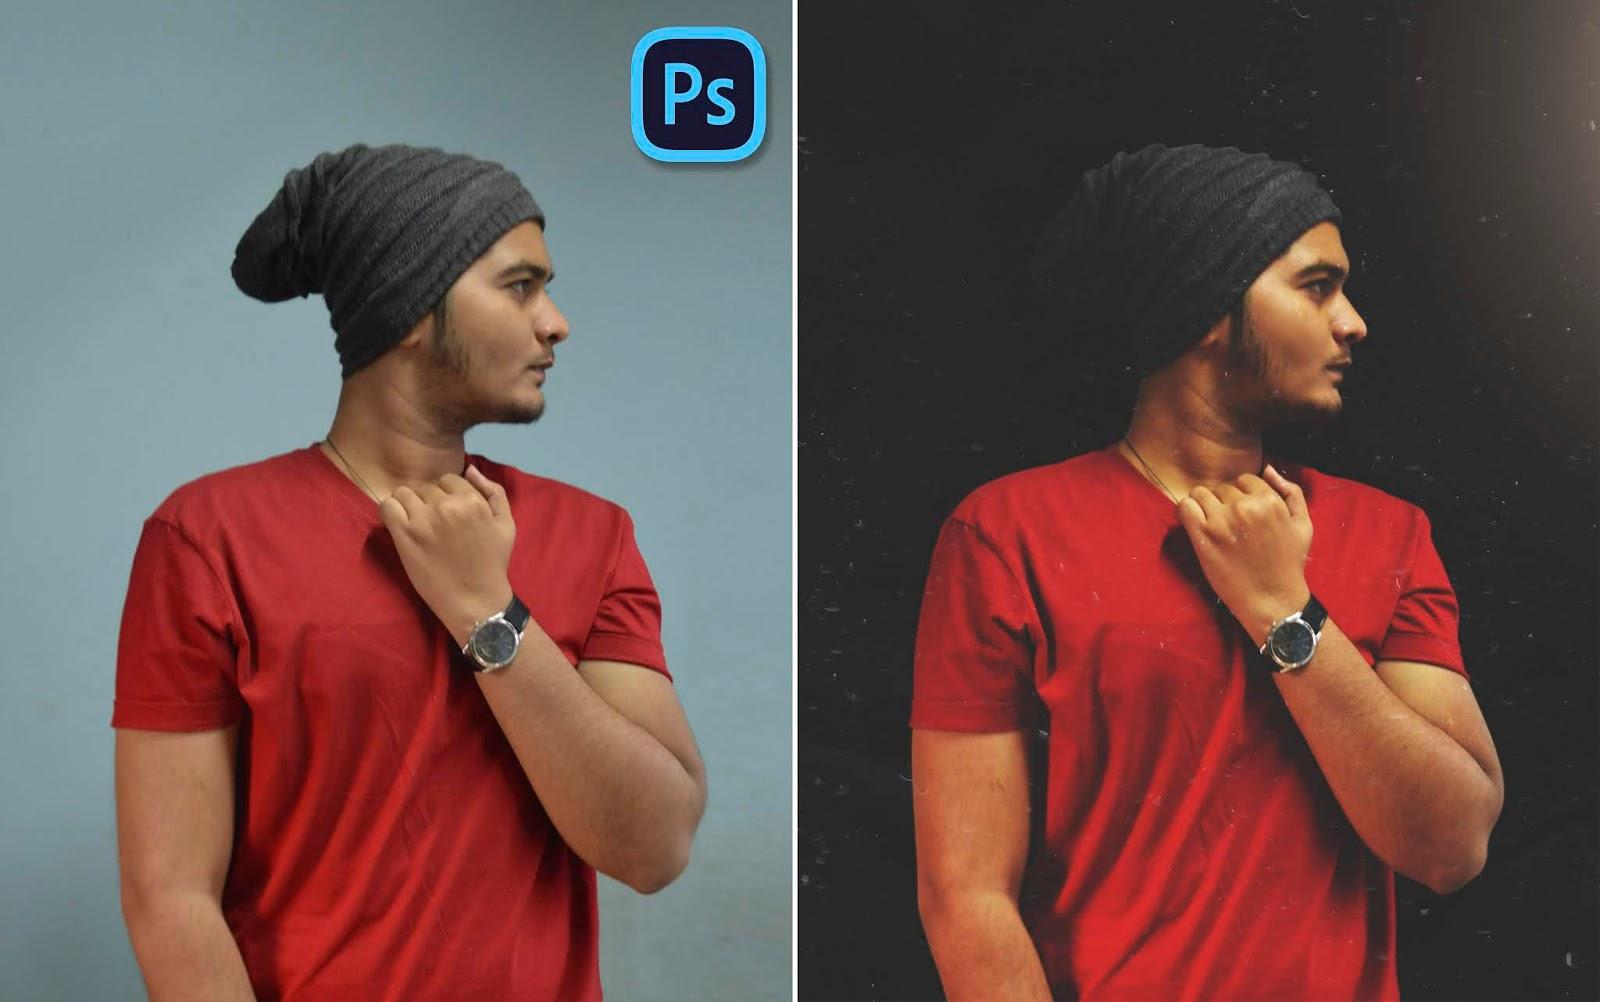 Perfect Pure Matt Black Photo Manipulation in Photoshop cc   Indoor Studio Like Photo Editing in Photoshop